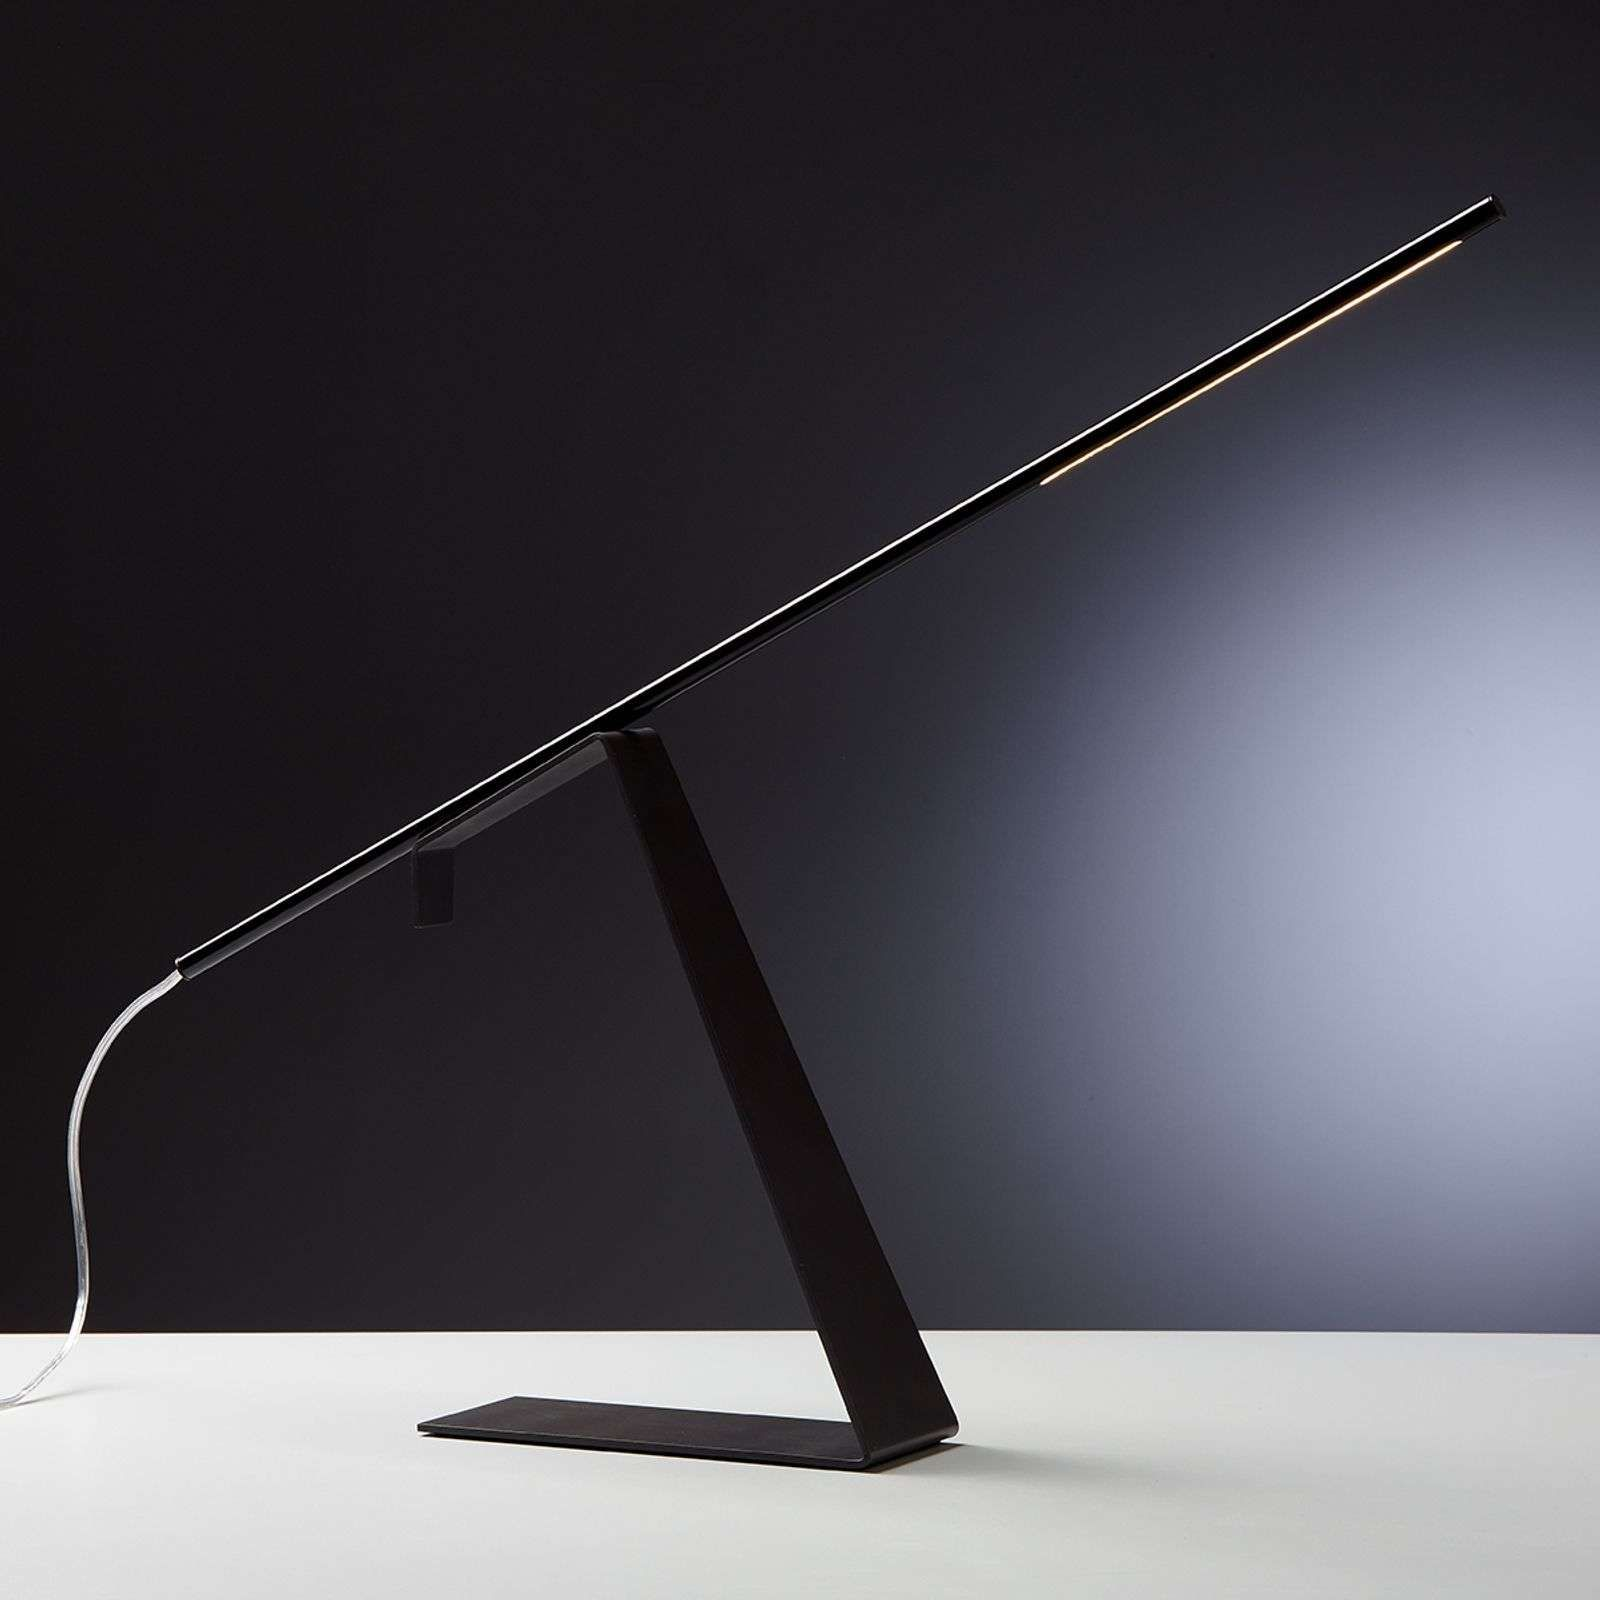 Lampe à Poser Led Design Noire Jella Led Lampe Lampe à Poser